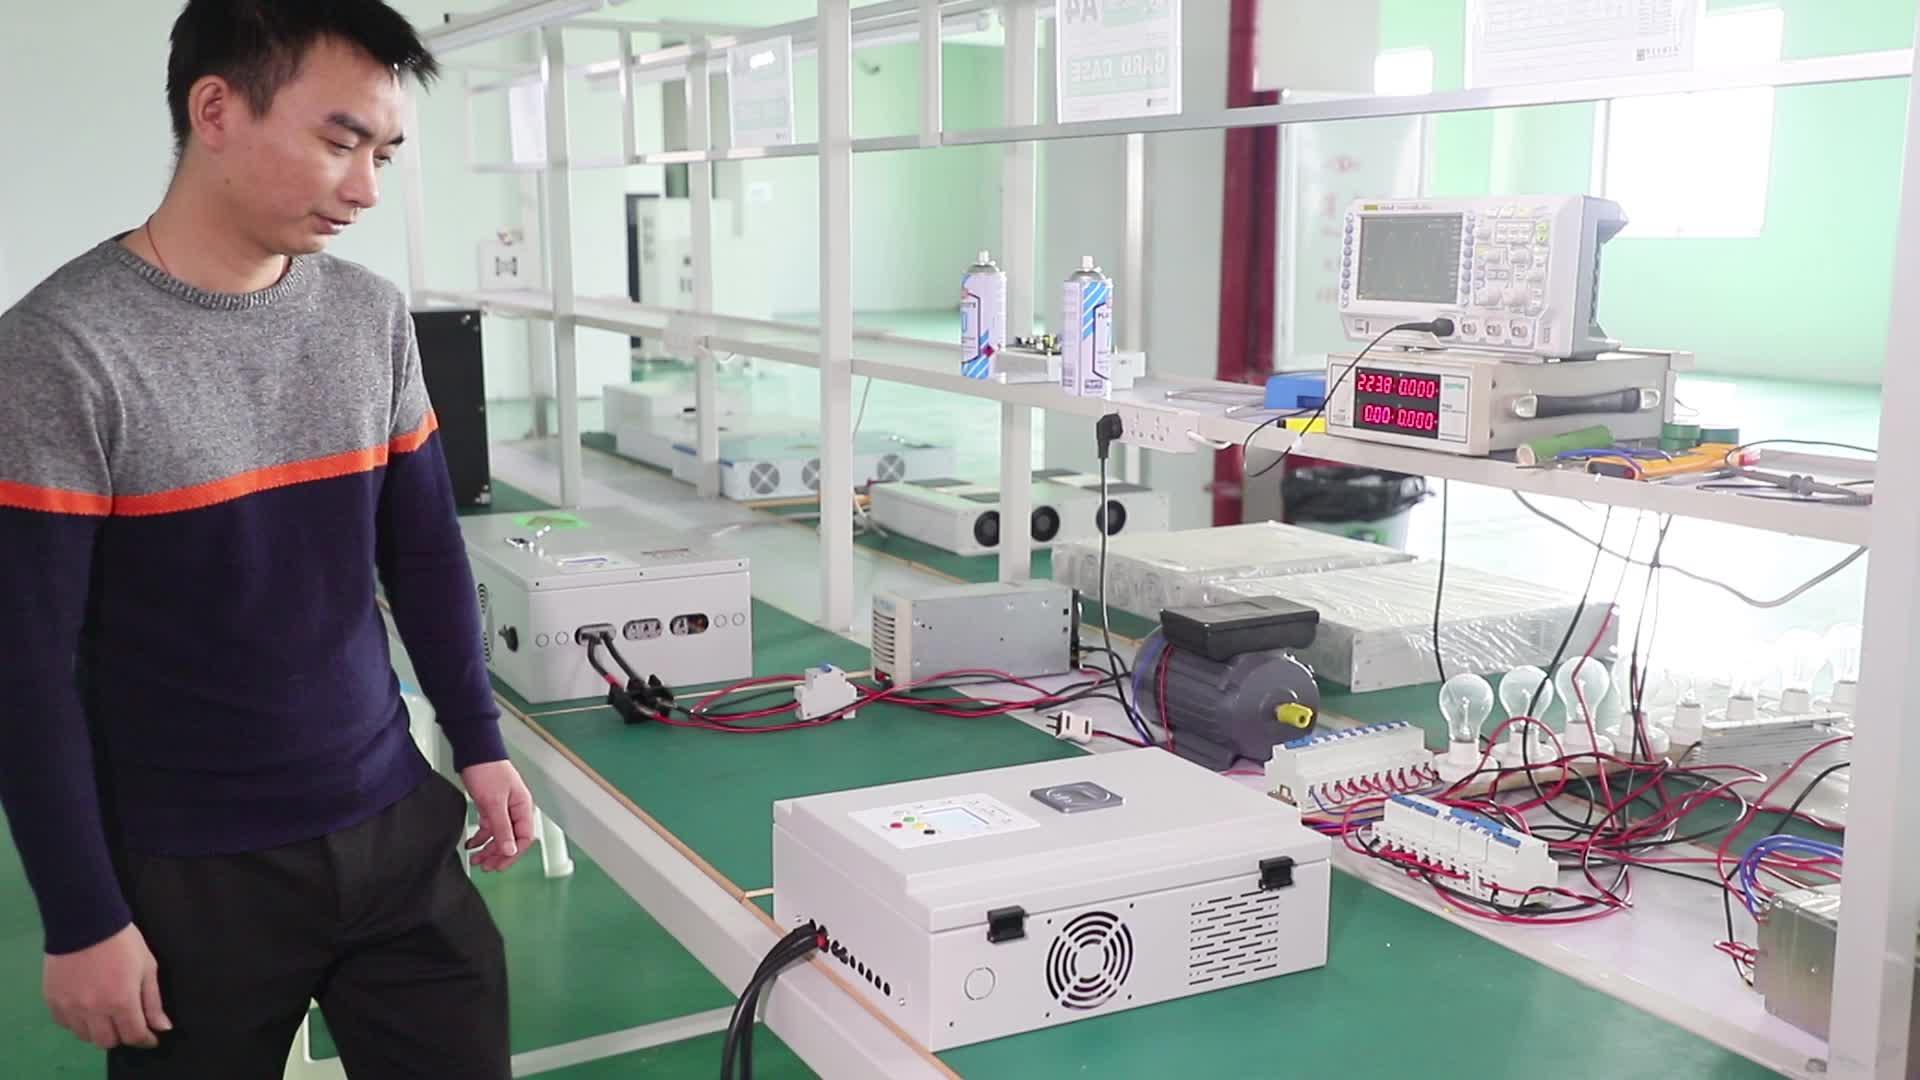 Chine Usine En Gros 1000 Watts Onduleur de Grille Onduleur Hybride Solaire Onduleur